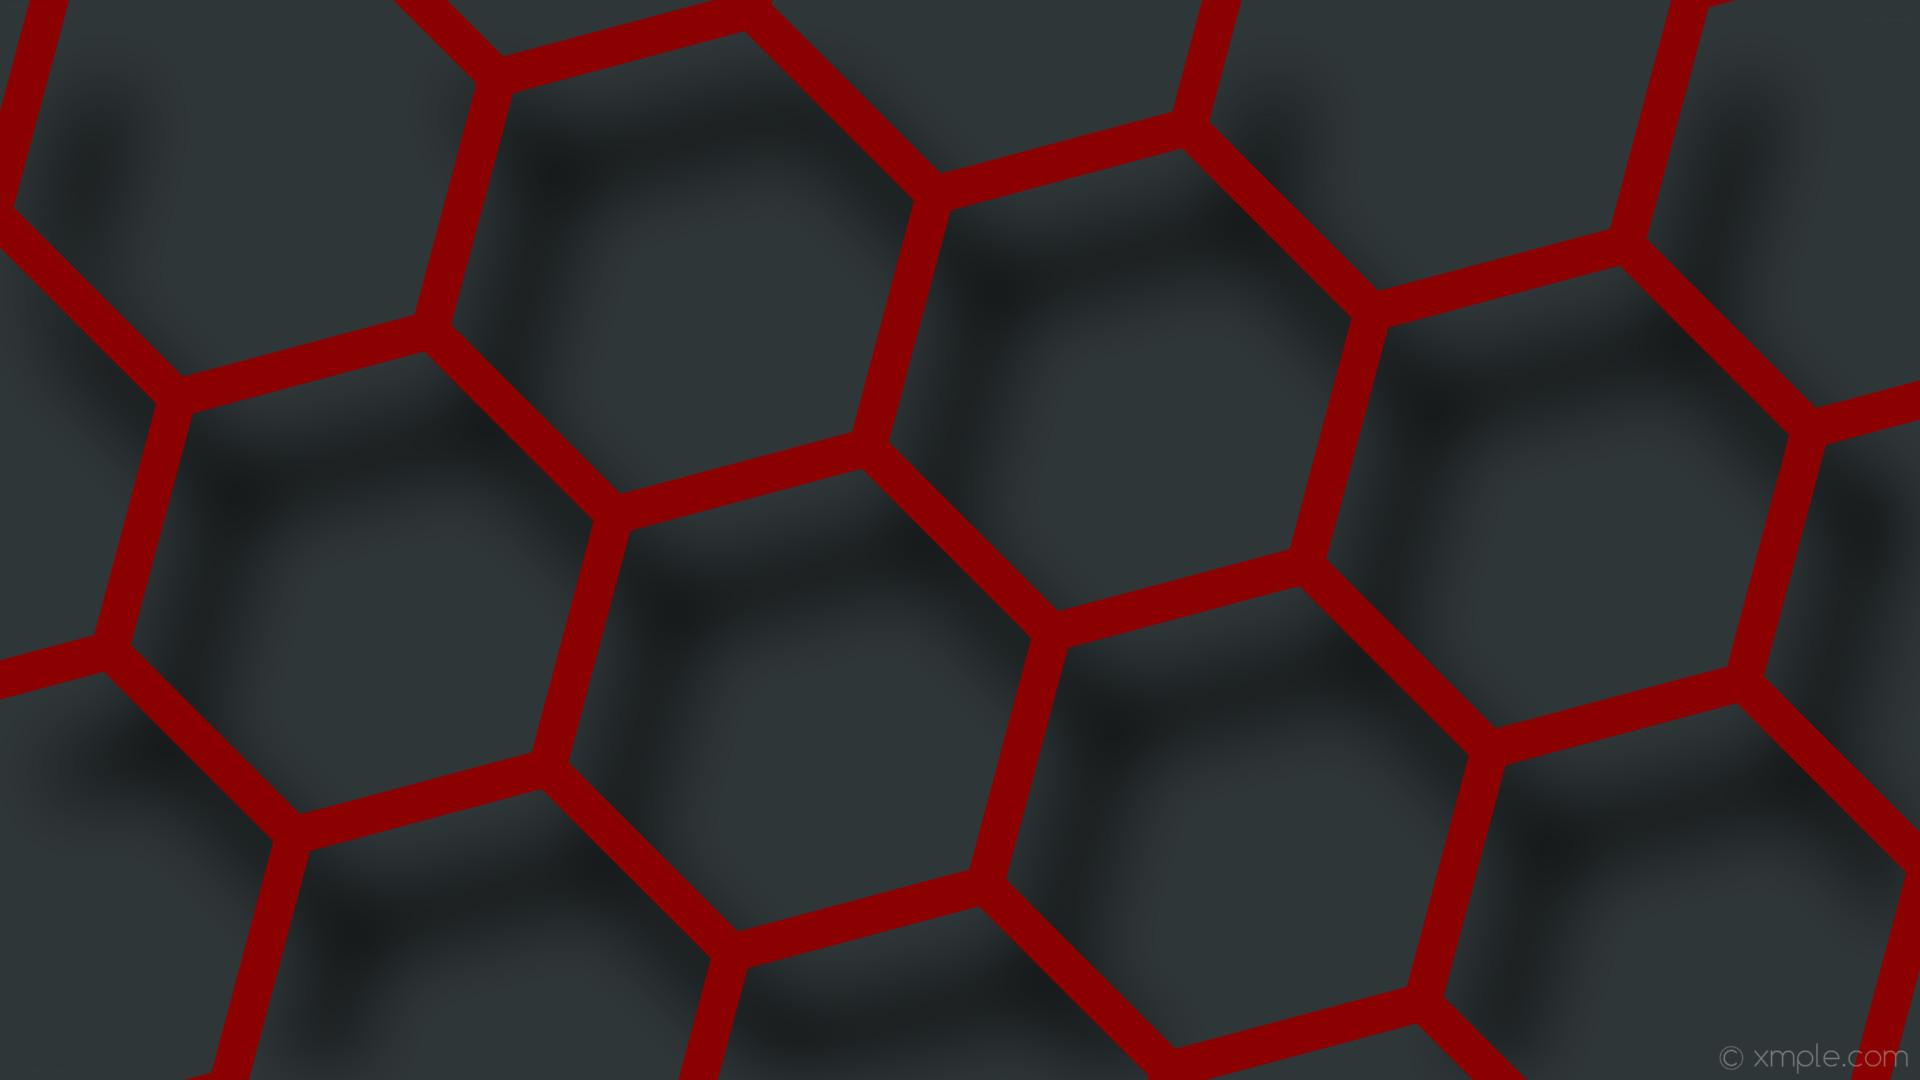 wallpaper beehive red hexagon gray drop shadow dark red #8b0000 #2f3638 45°  38px